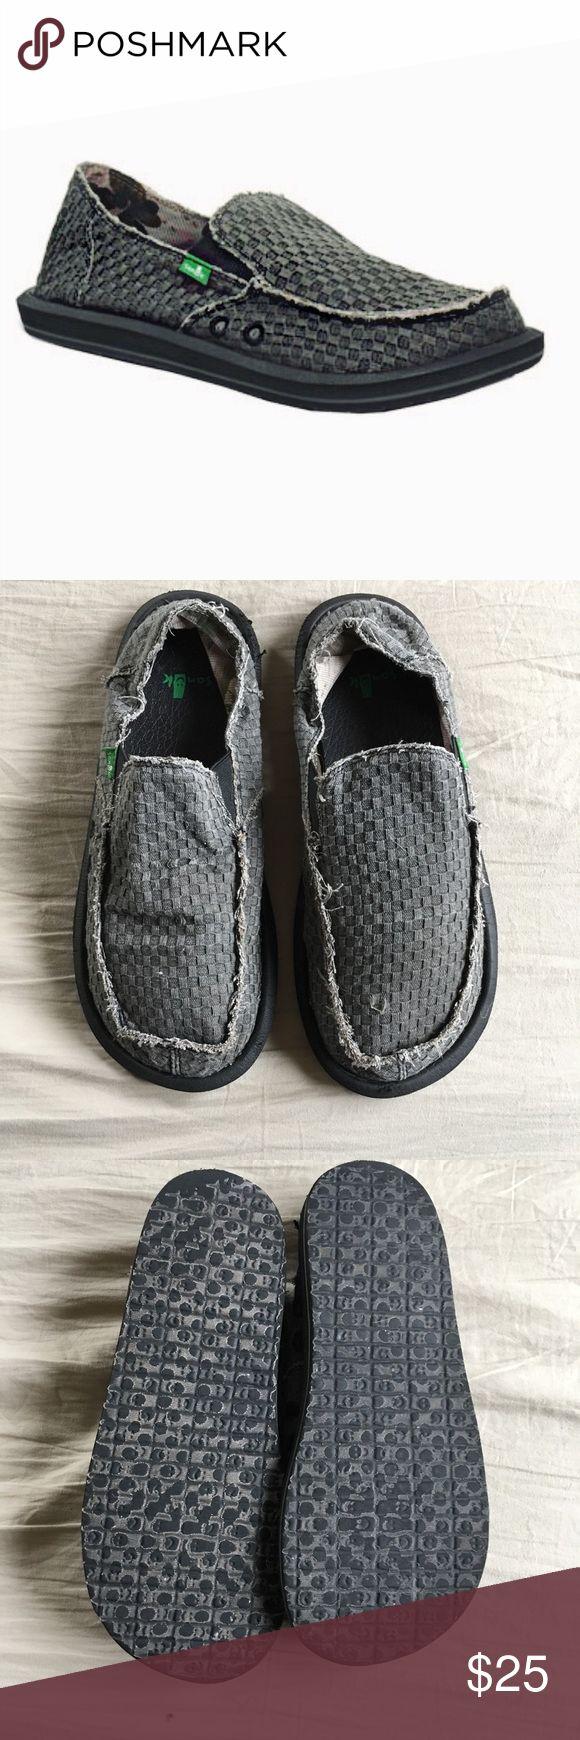 {Sanuk} Men's Vegabond Loafers Primarily Sanuks are beach shoes, Men's size 11, Shoes Loafers & Slip-Ons